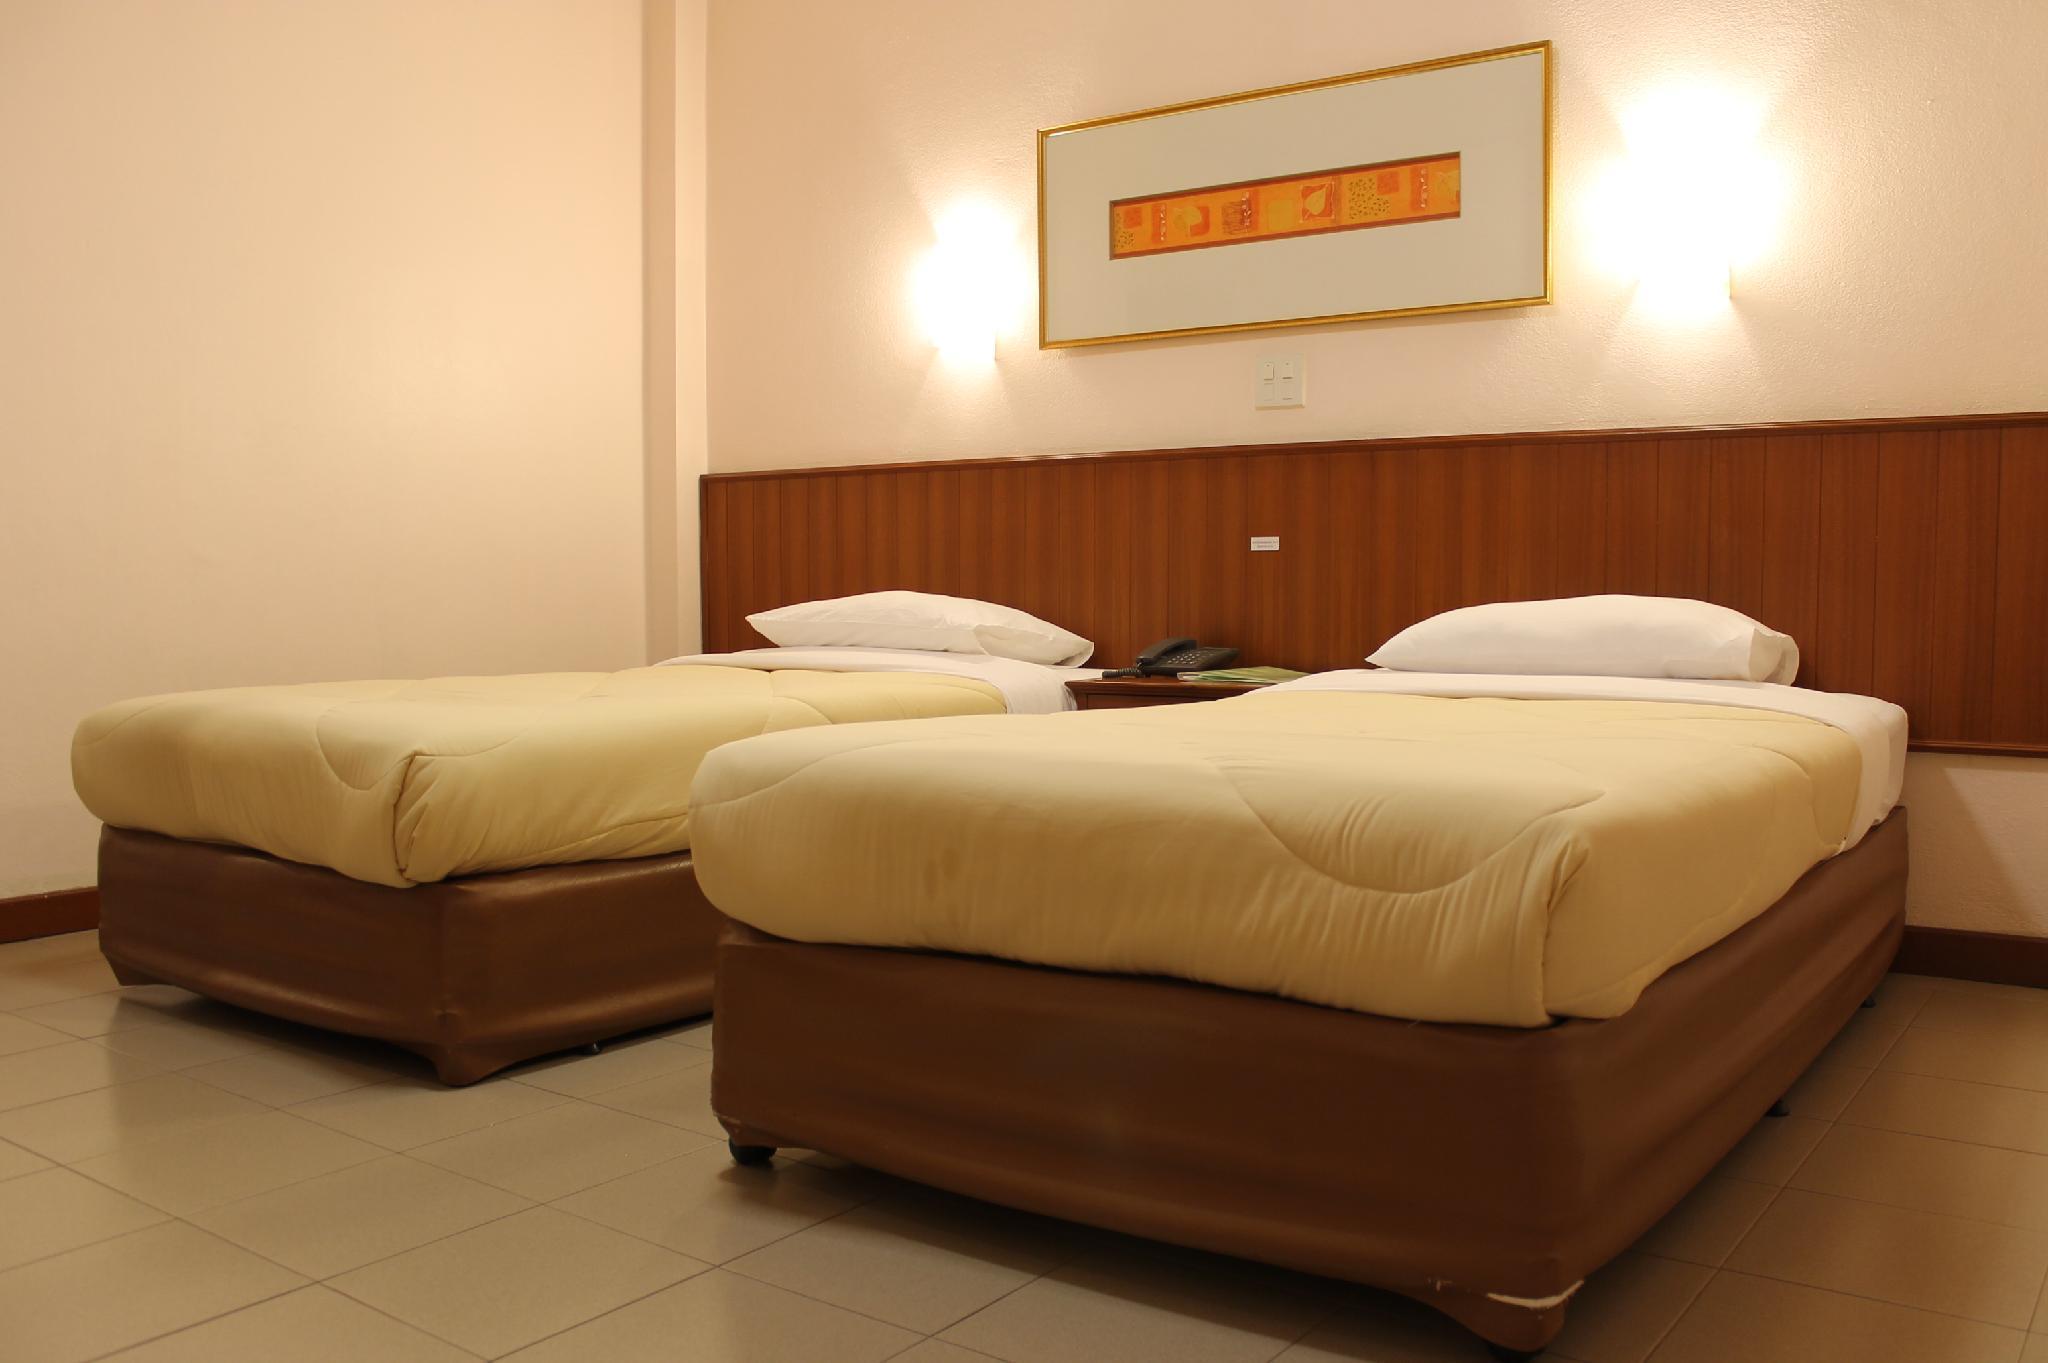 Rattana Park Hotel,โรงแรมรัตนาปาร์ค